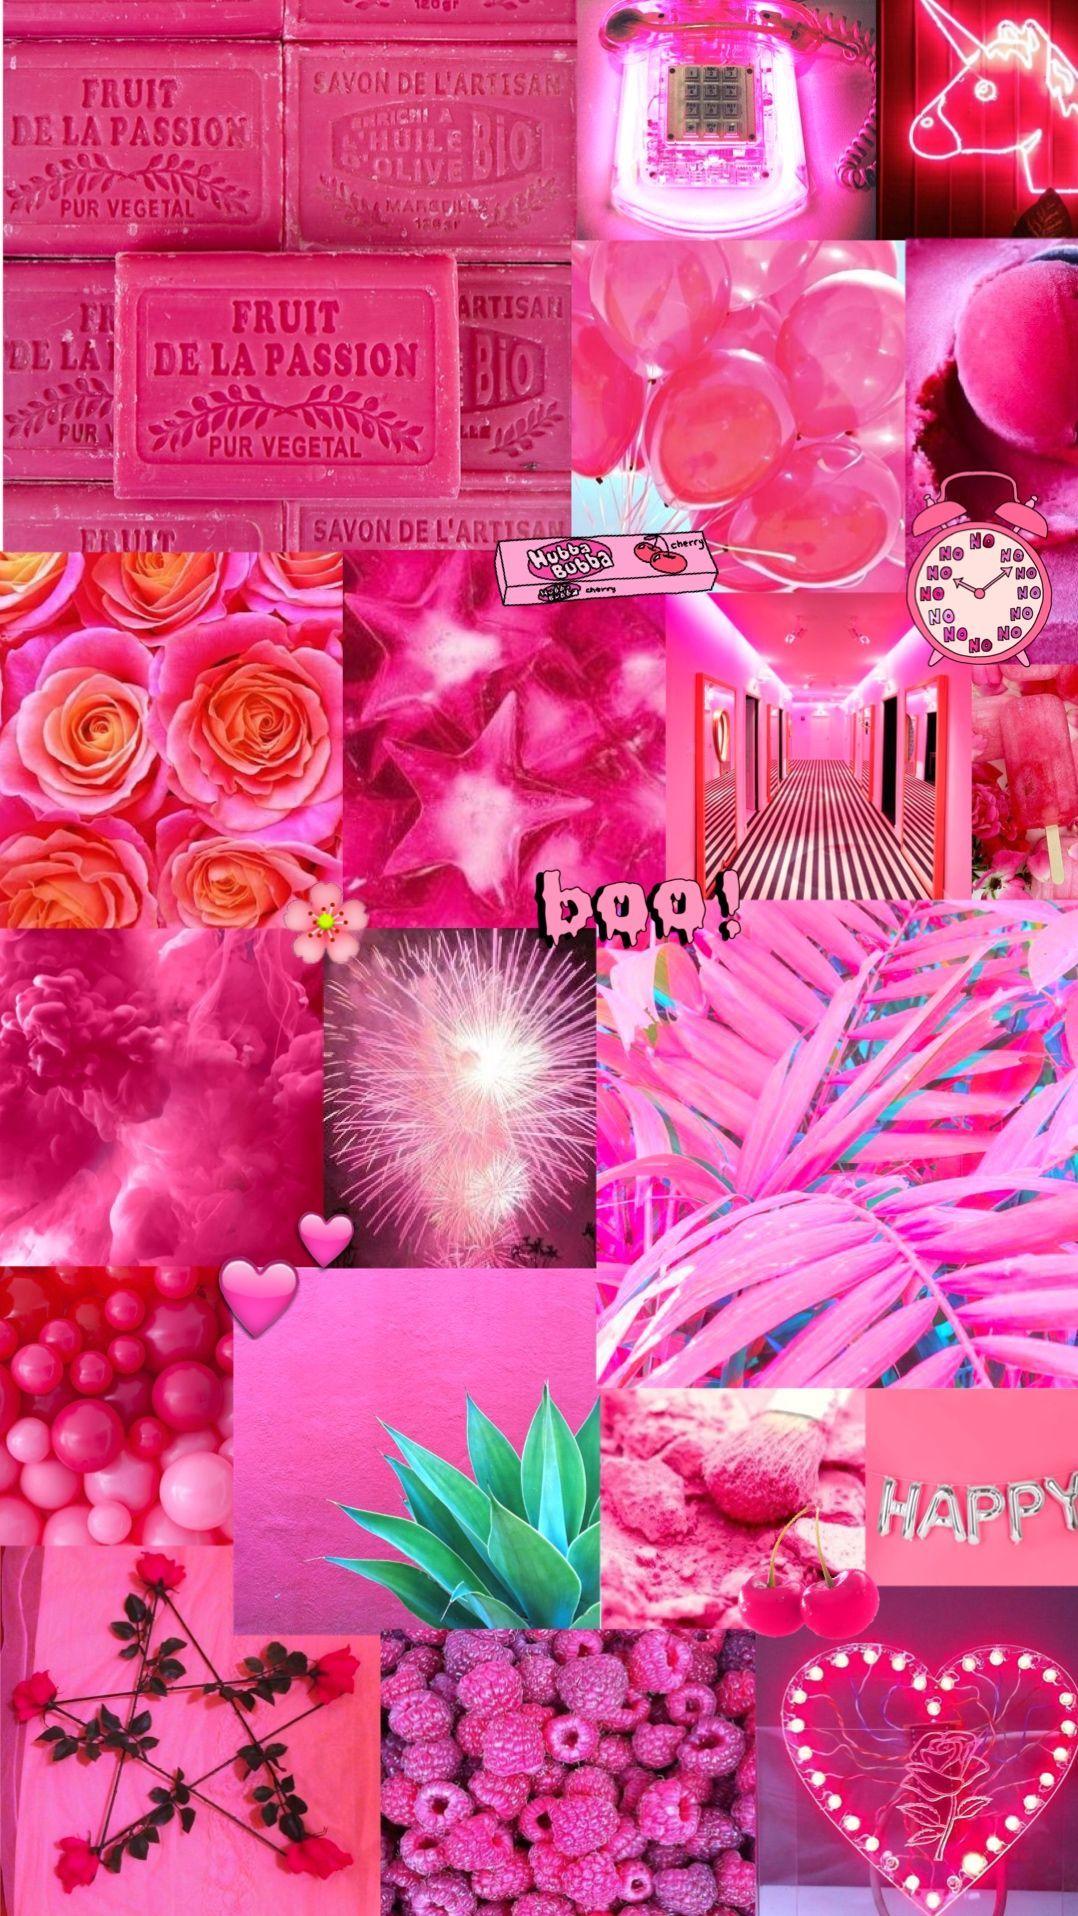 Hot Pink Aesthetic Wallpapers Wallpaper Cave Aesthetics digital wallpaper, vaporwave, kanji, chinese characters. hot pink aesthetic wallpapers